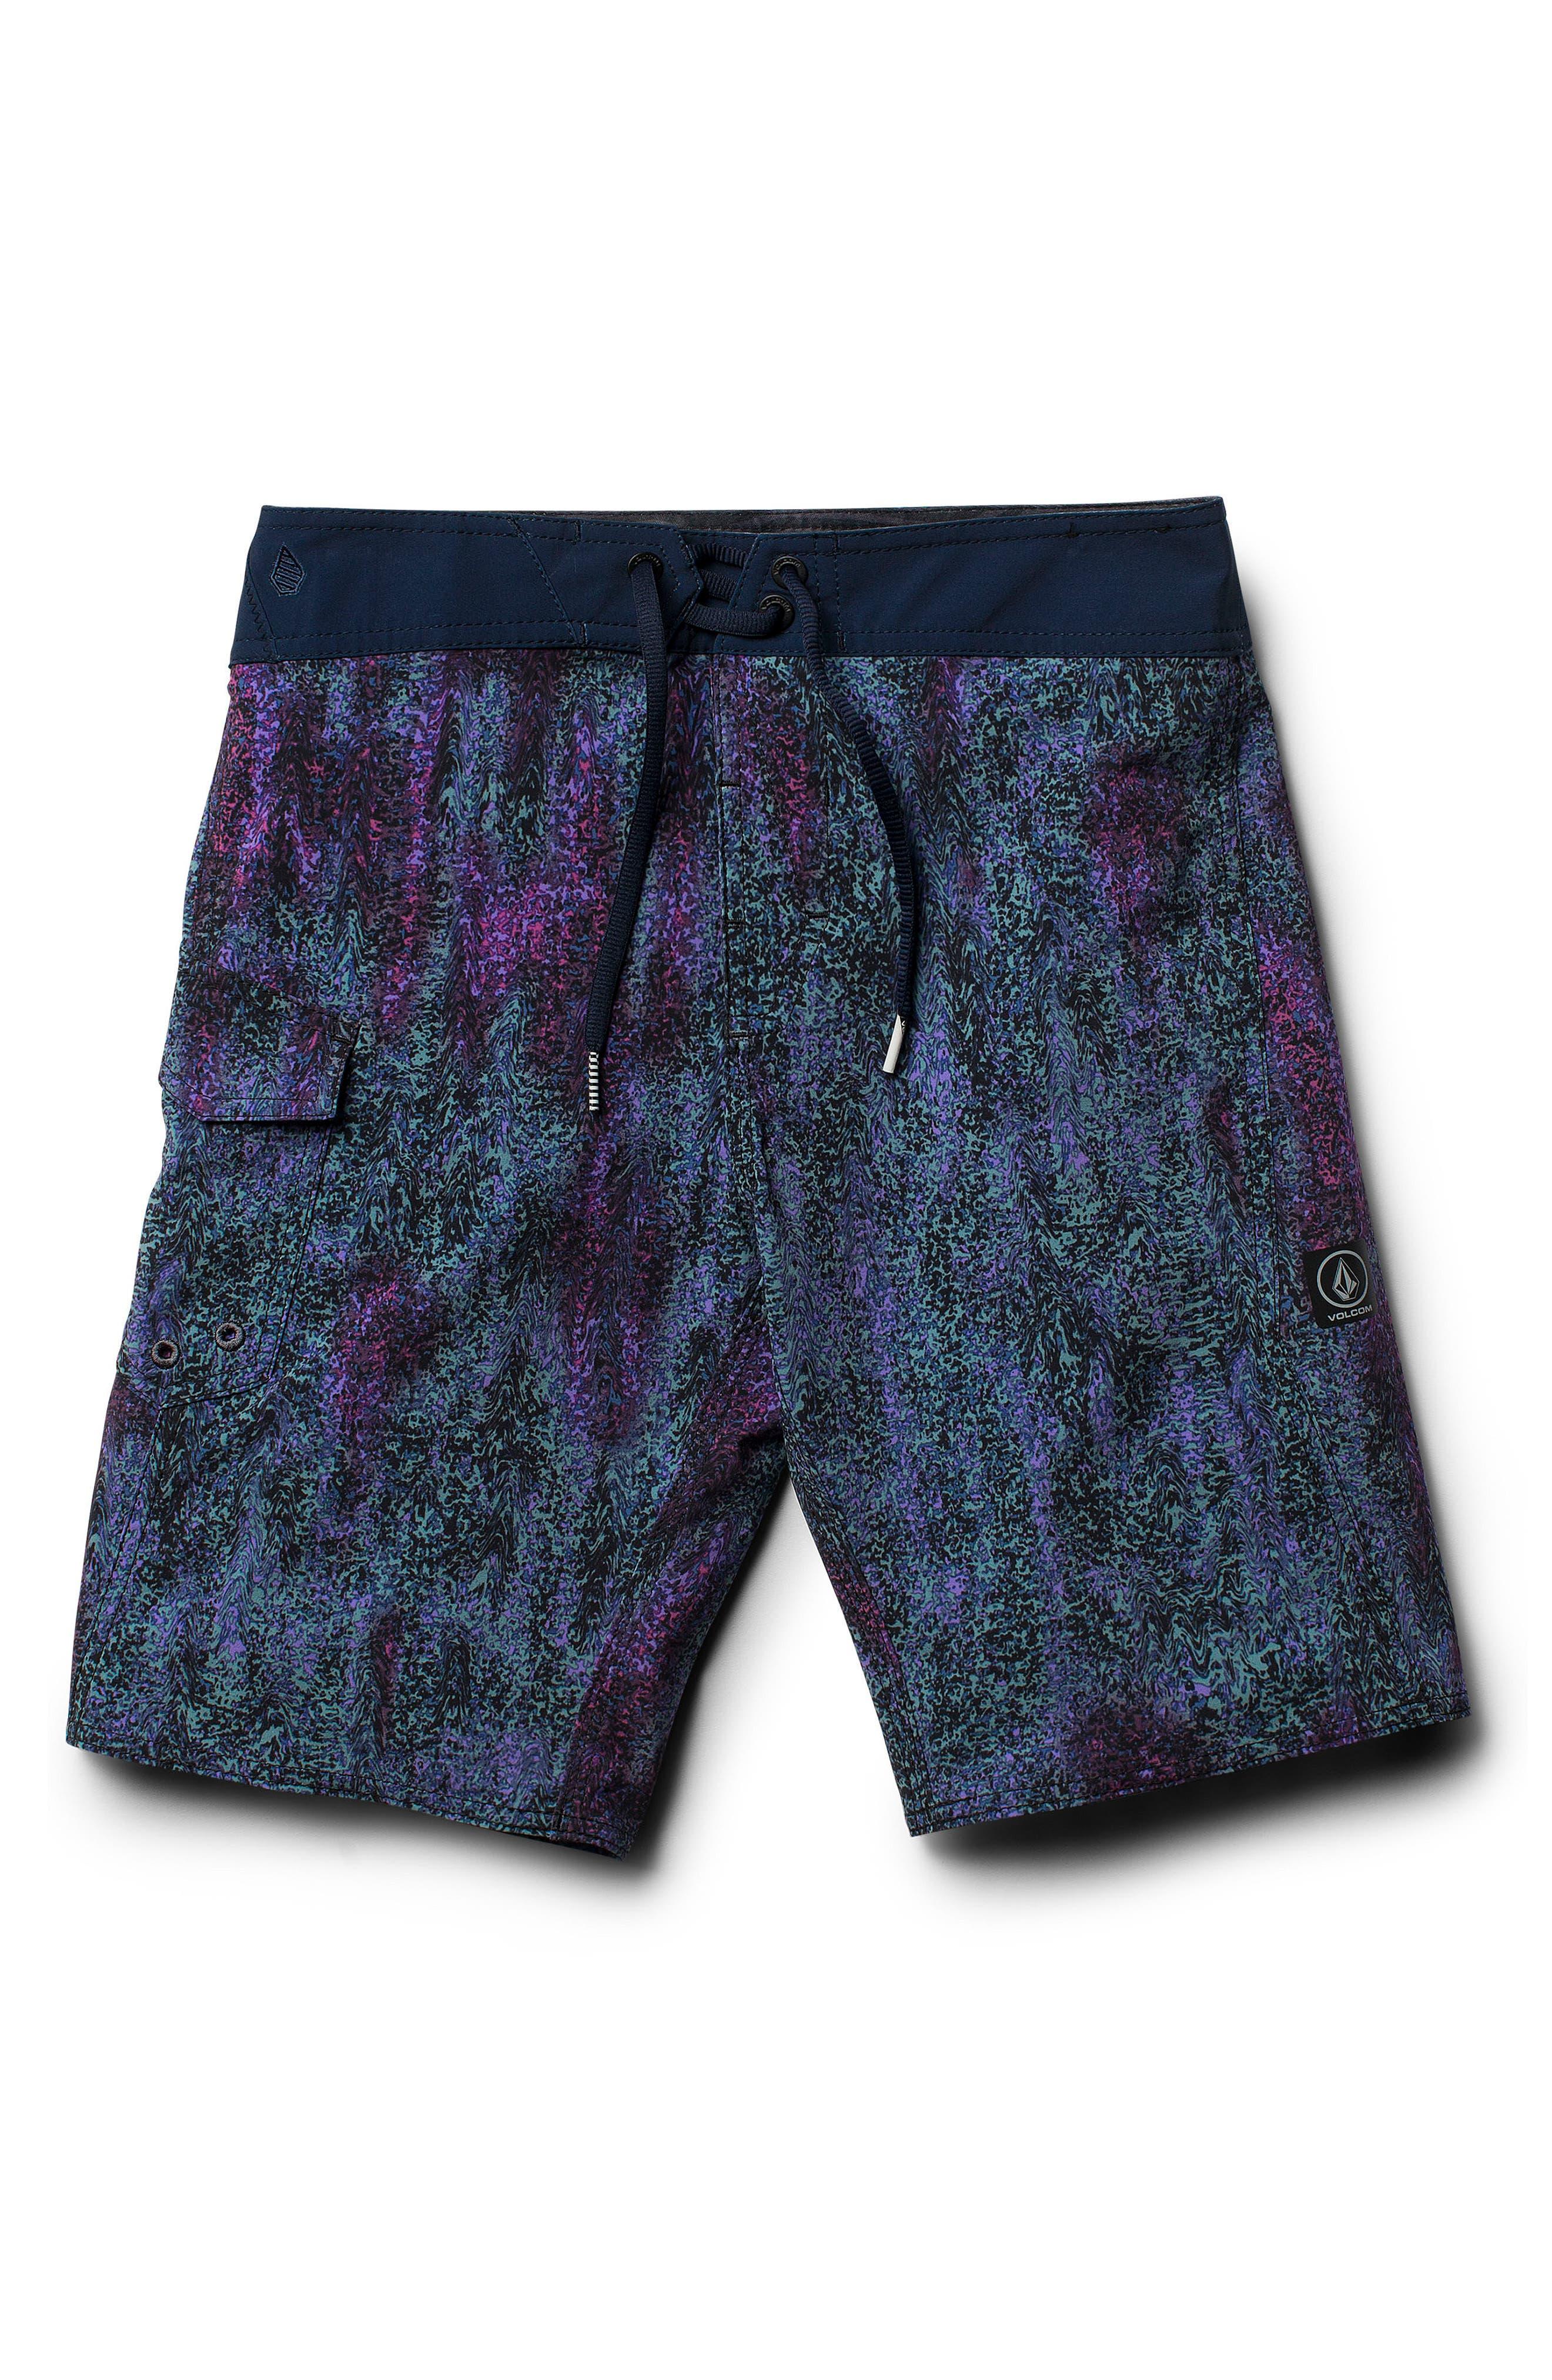 Plasm Mod Board Shorts,                         Main,                         color, Indigo